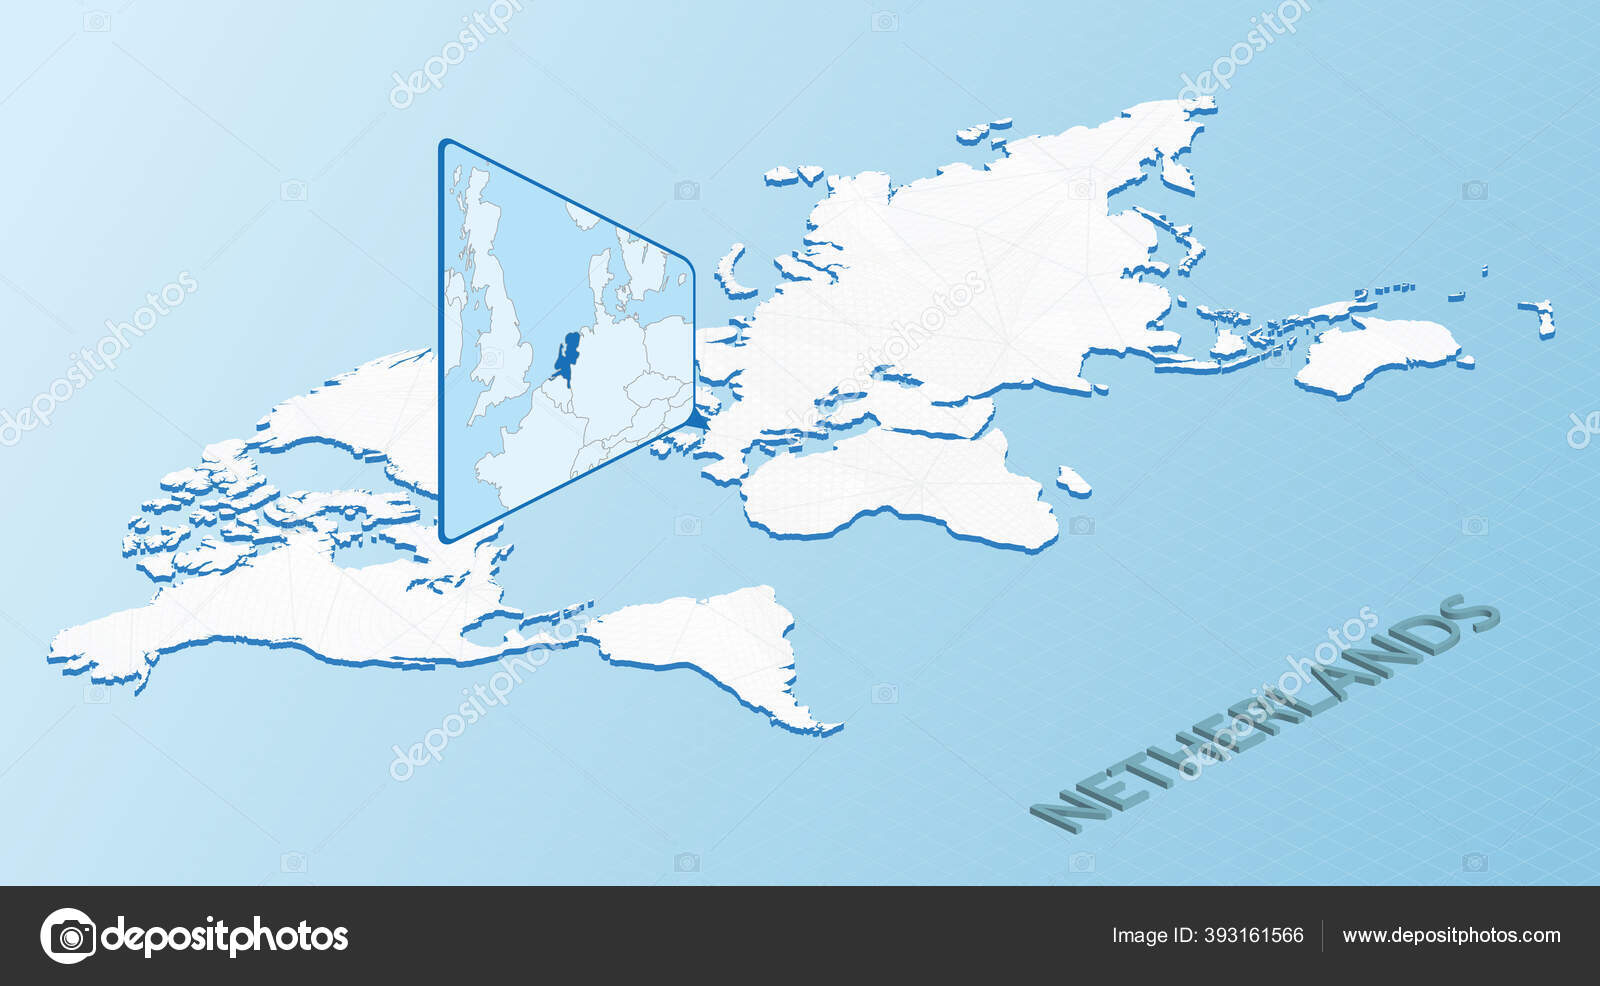 Image of: World Map Isometric Style Detailed Map Netherlands Light Blue Netherlands Stock Vector C Boldg 393161566